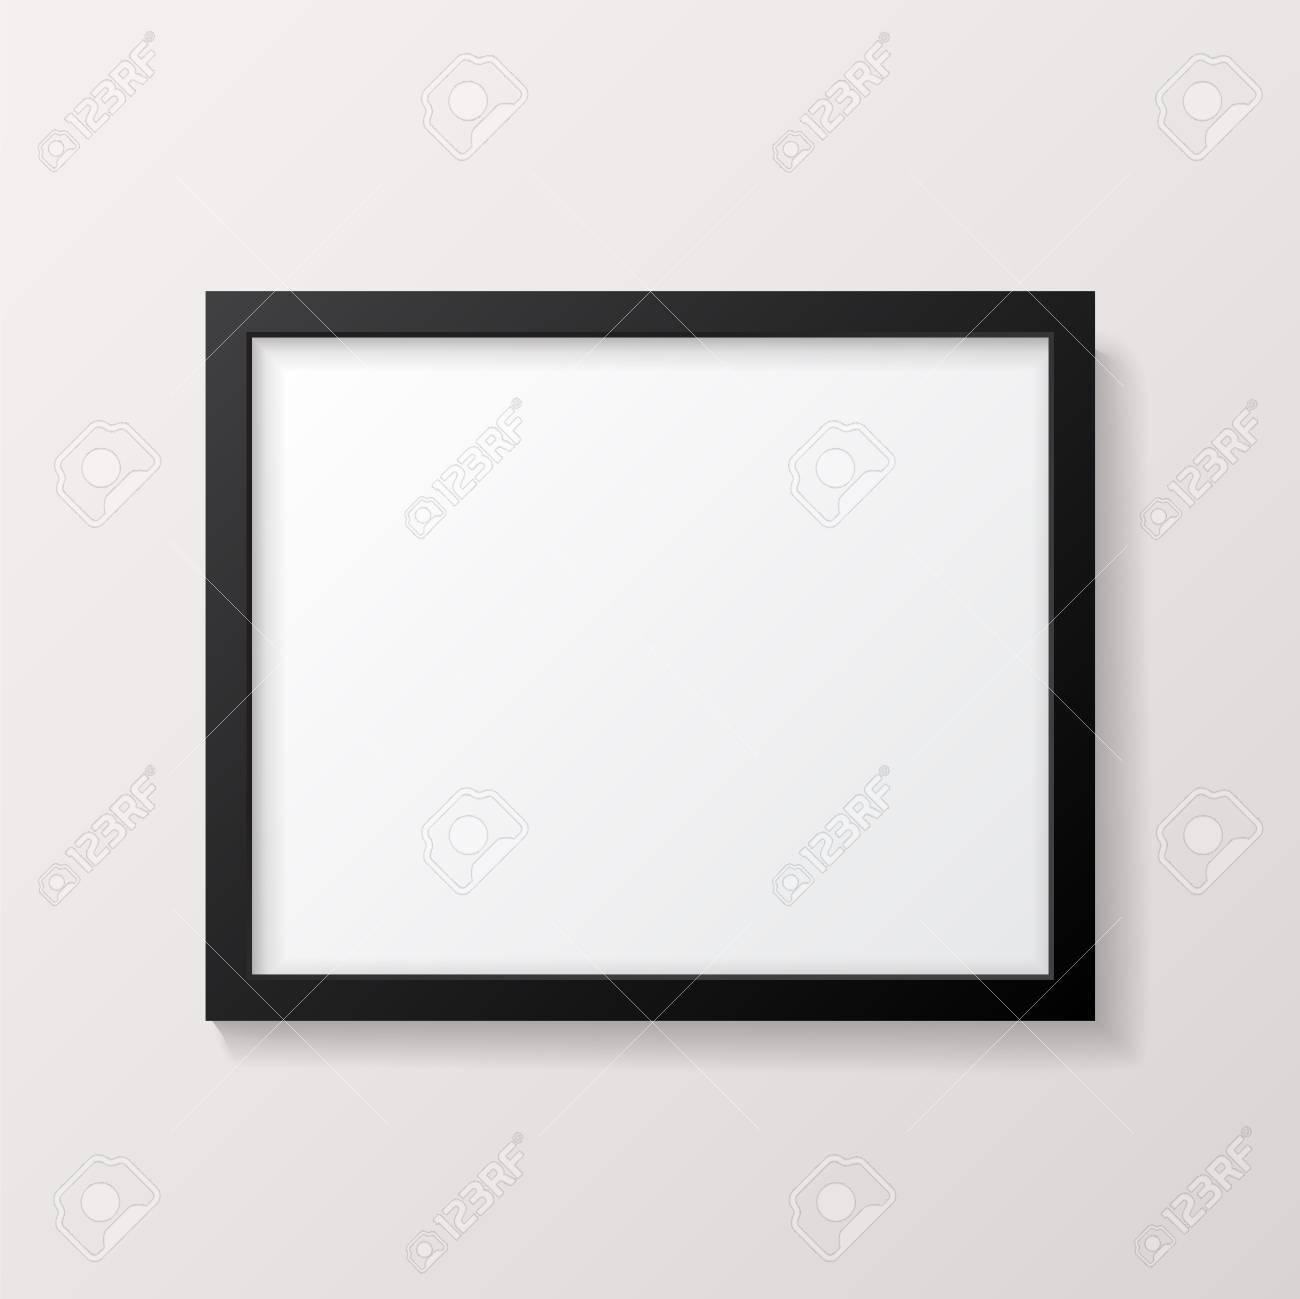 Realistic Empty Black Picture Frame Mockup Realistic Empty